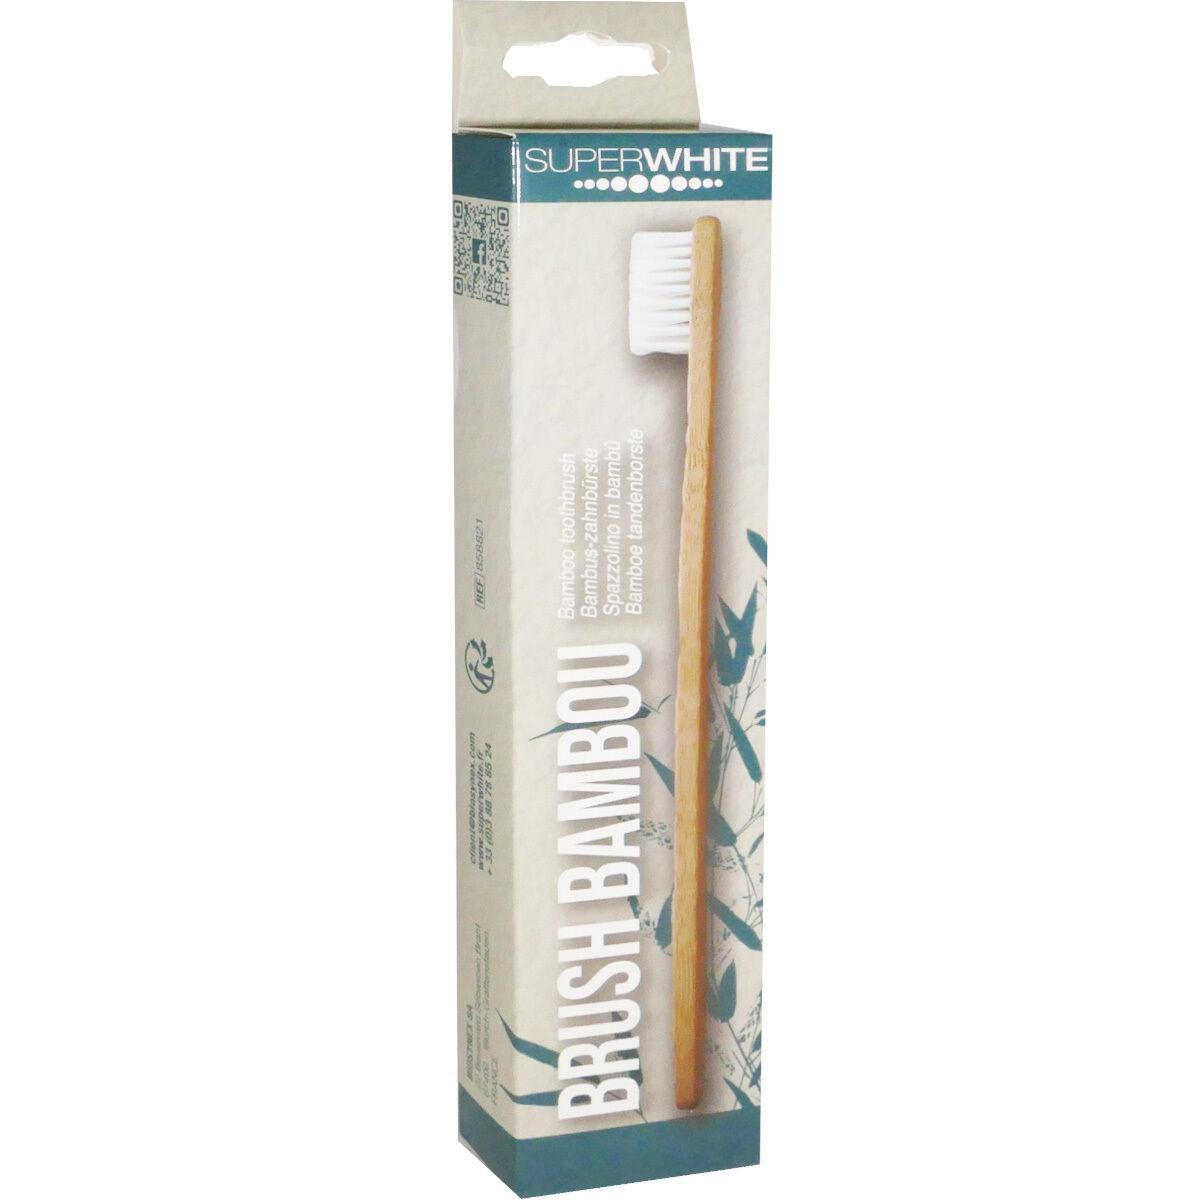 DECTRA PHARM Brush bambou brosse a dents